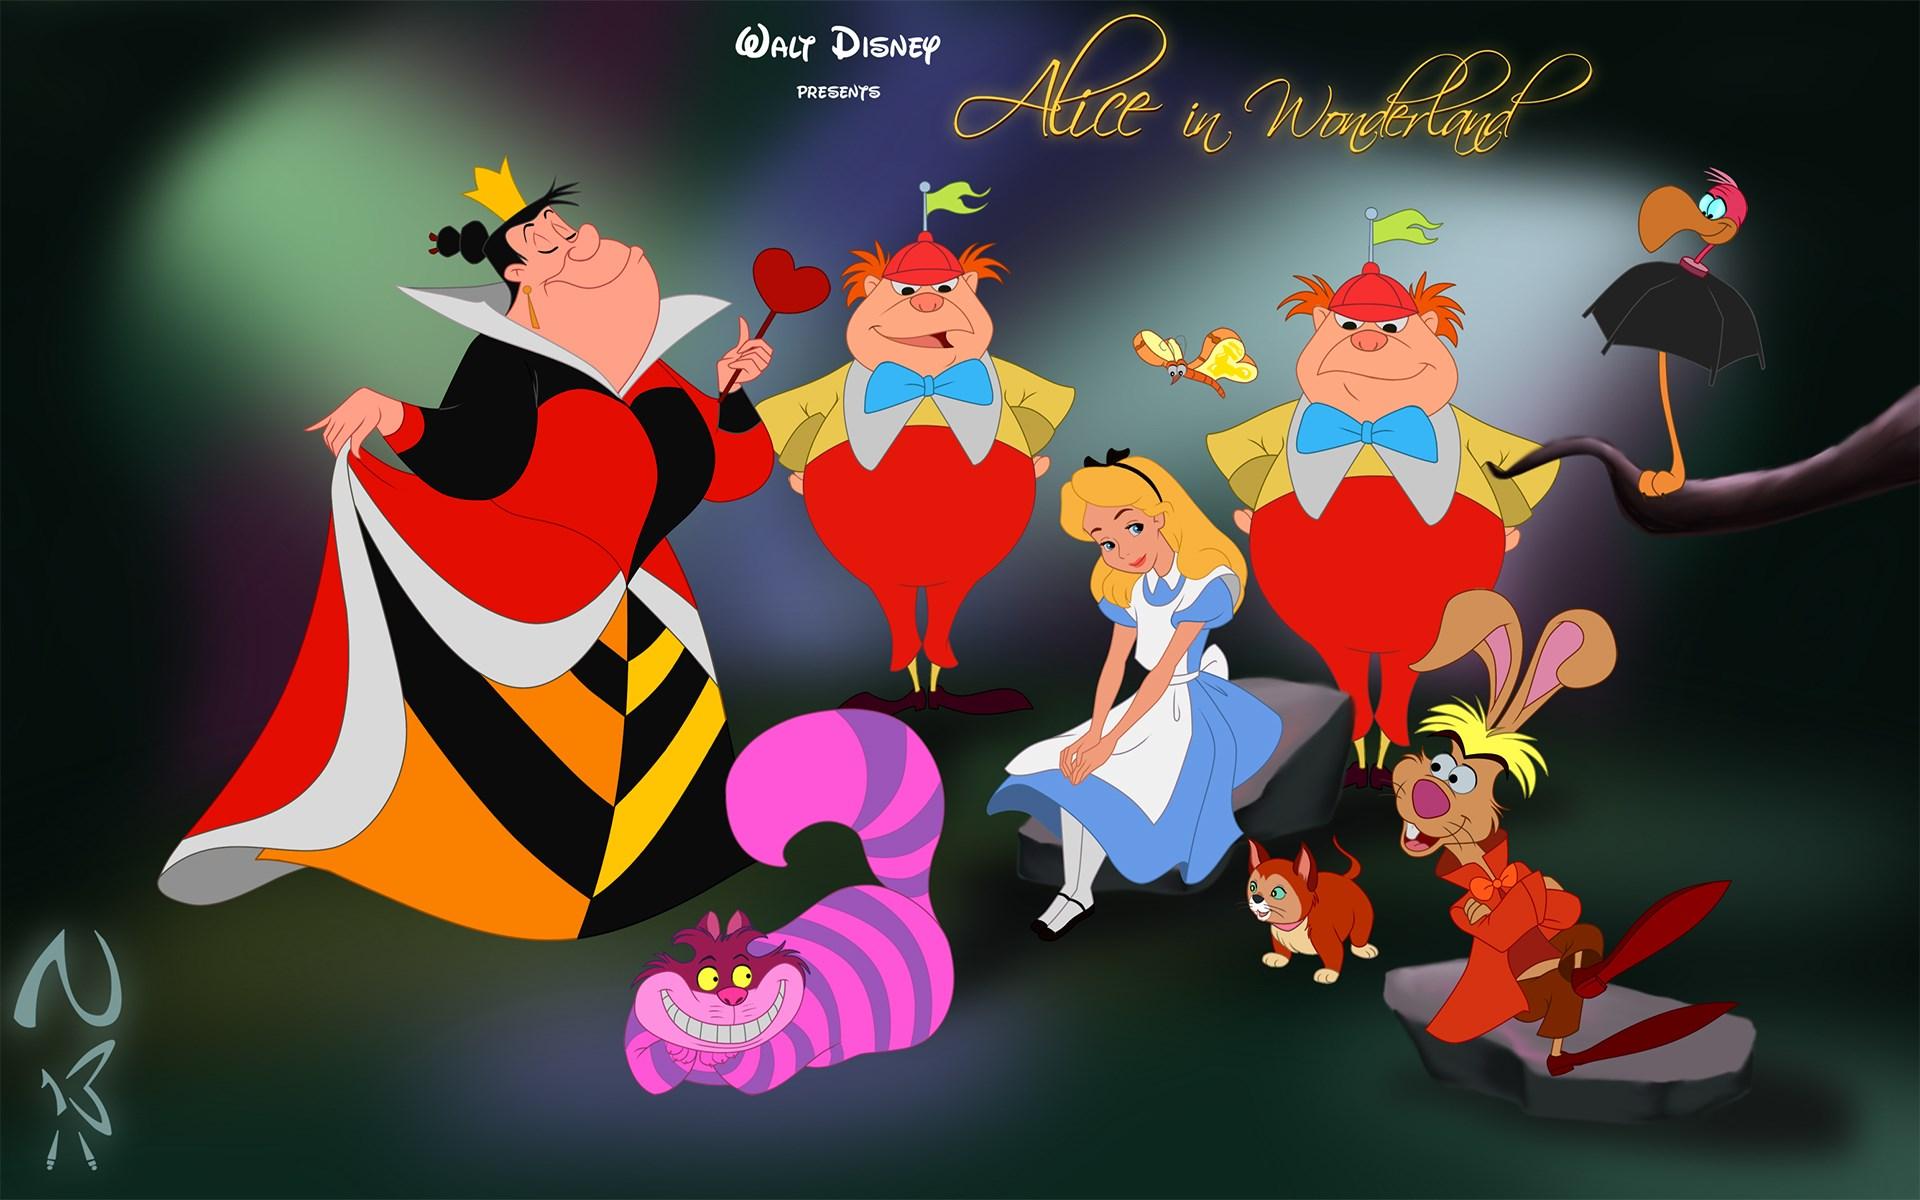 Peaky Blinders Iphone Wallpaper Alice In Wonderland Desktop Backgrounds 37 Wallpapers